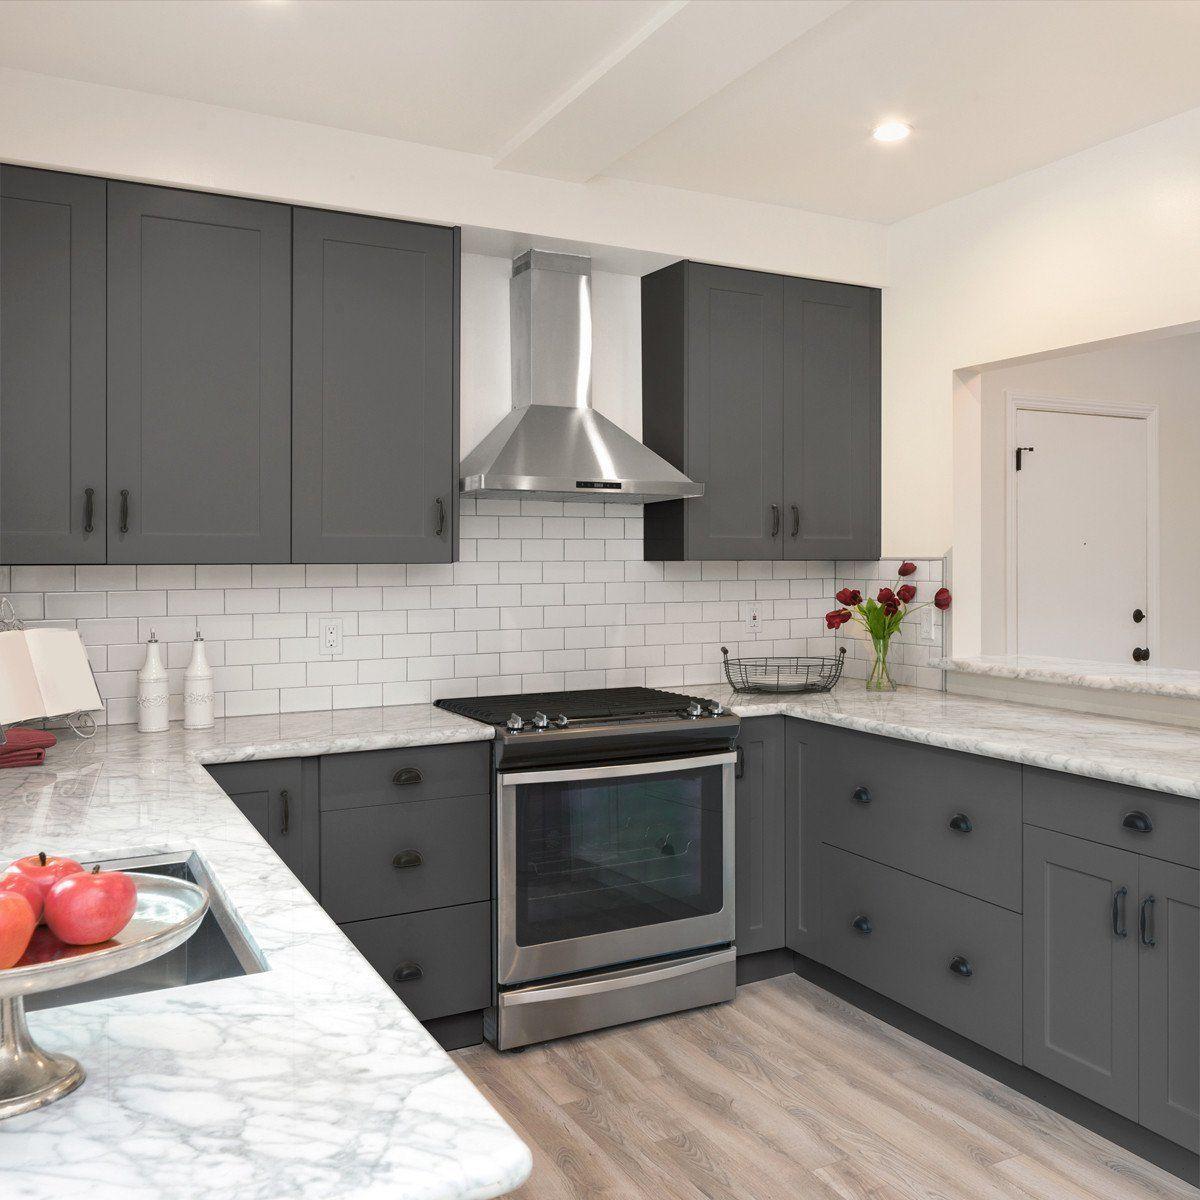 Money-saving kitchen renovation hacks - refurbish cabinet